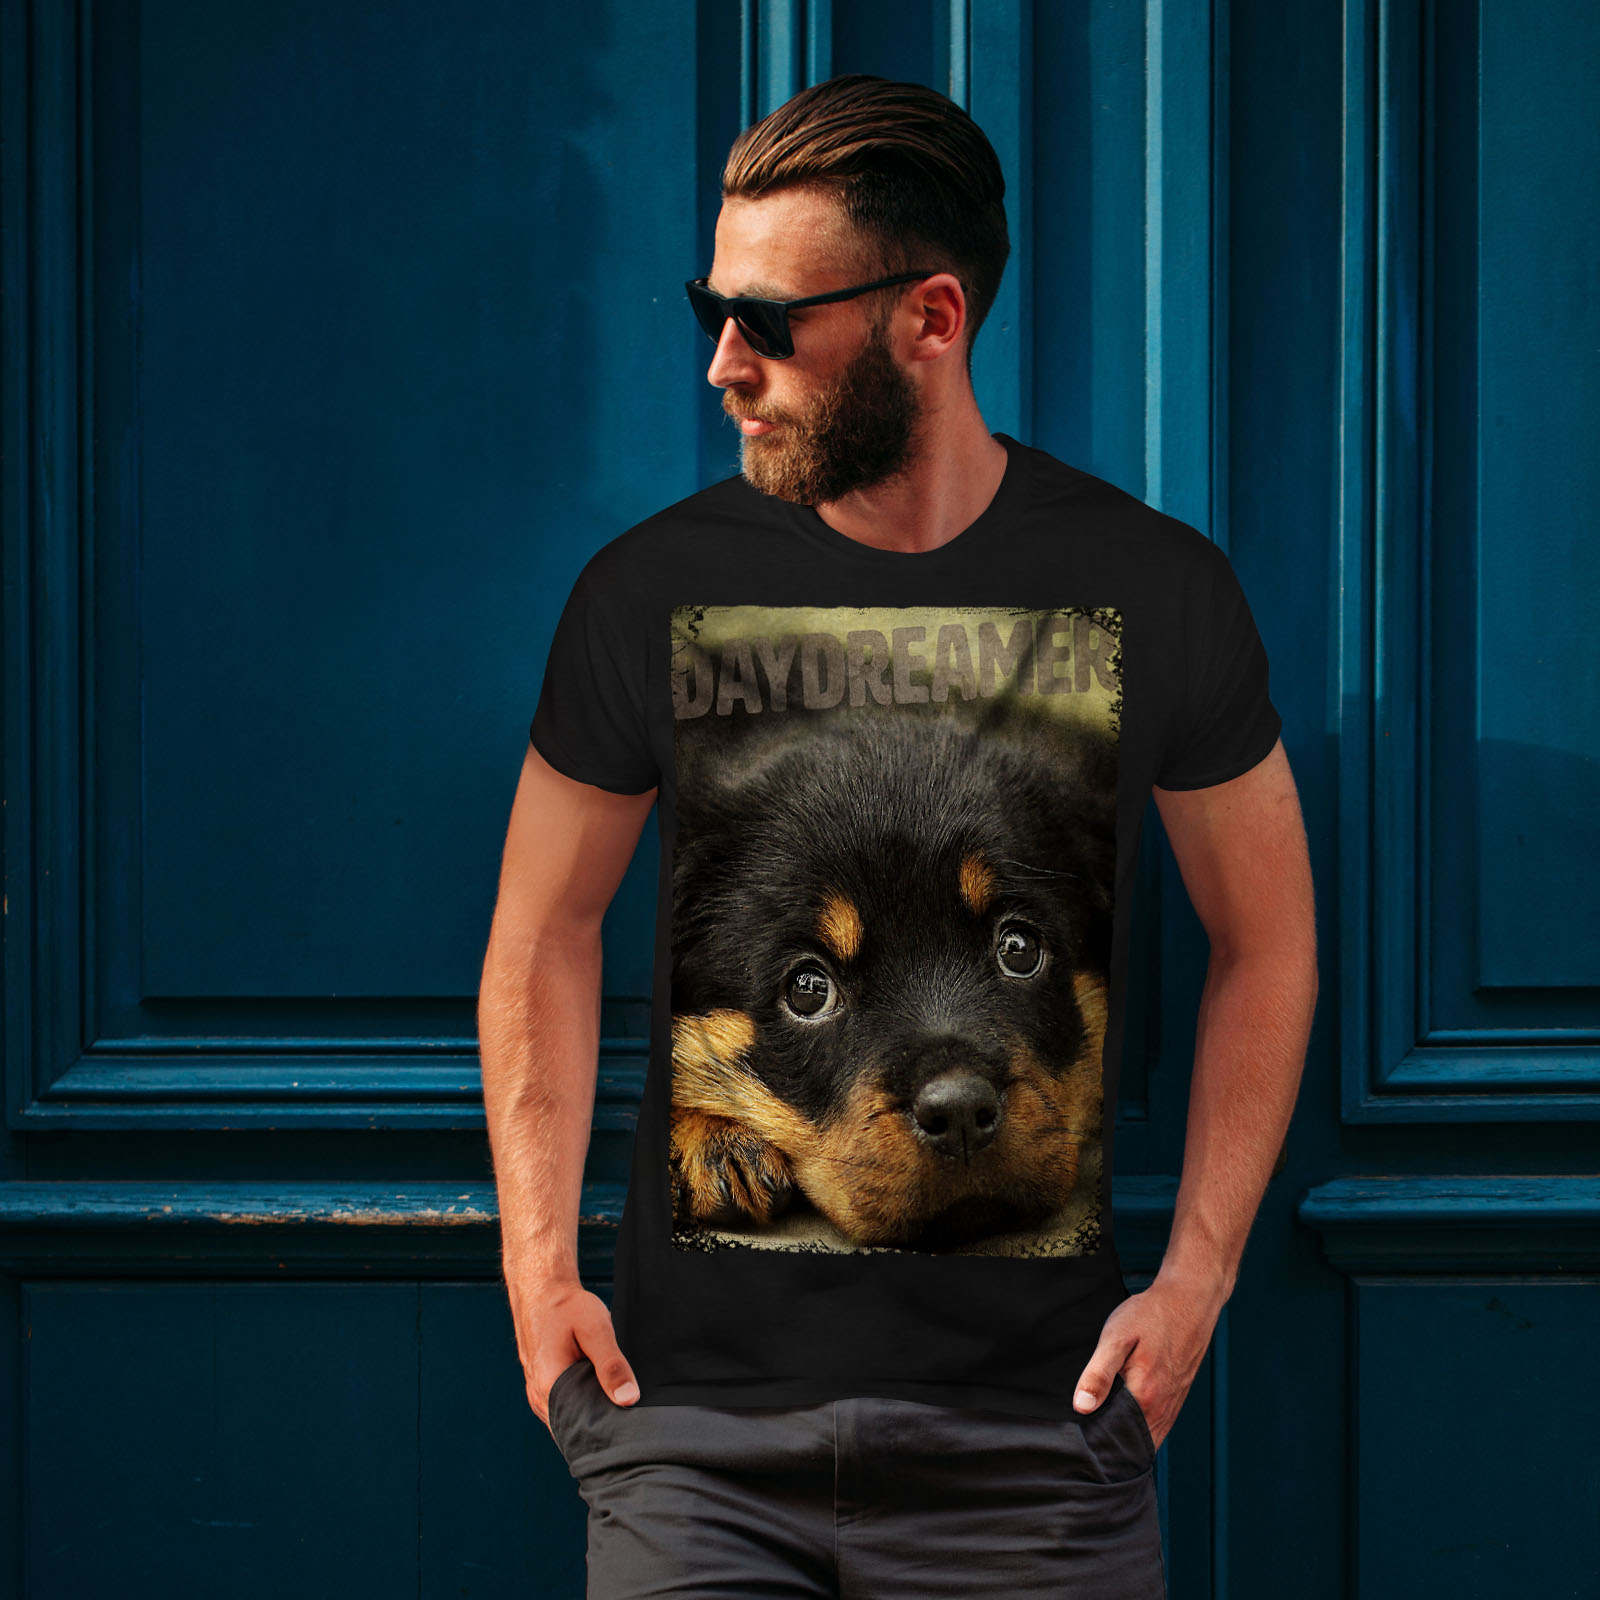 Pup Graphic Design Printed Tee Wellcoda Daydreamer Puppy Cute Dog Mens T-shirt